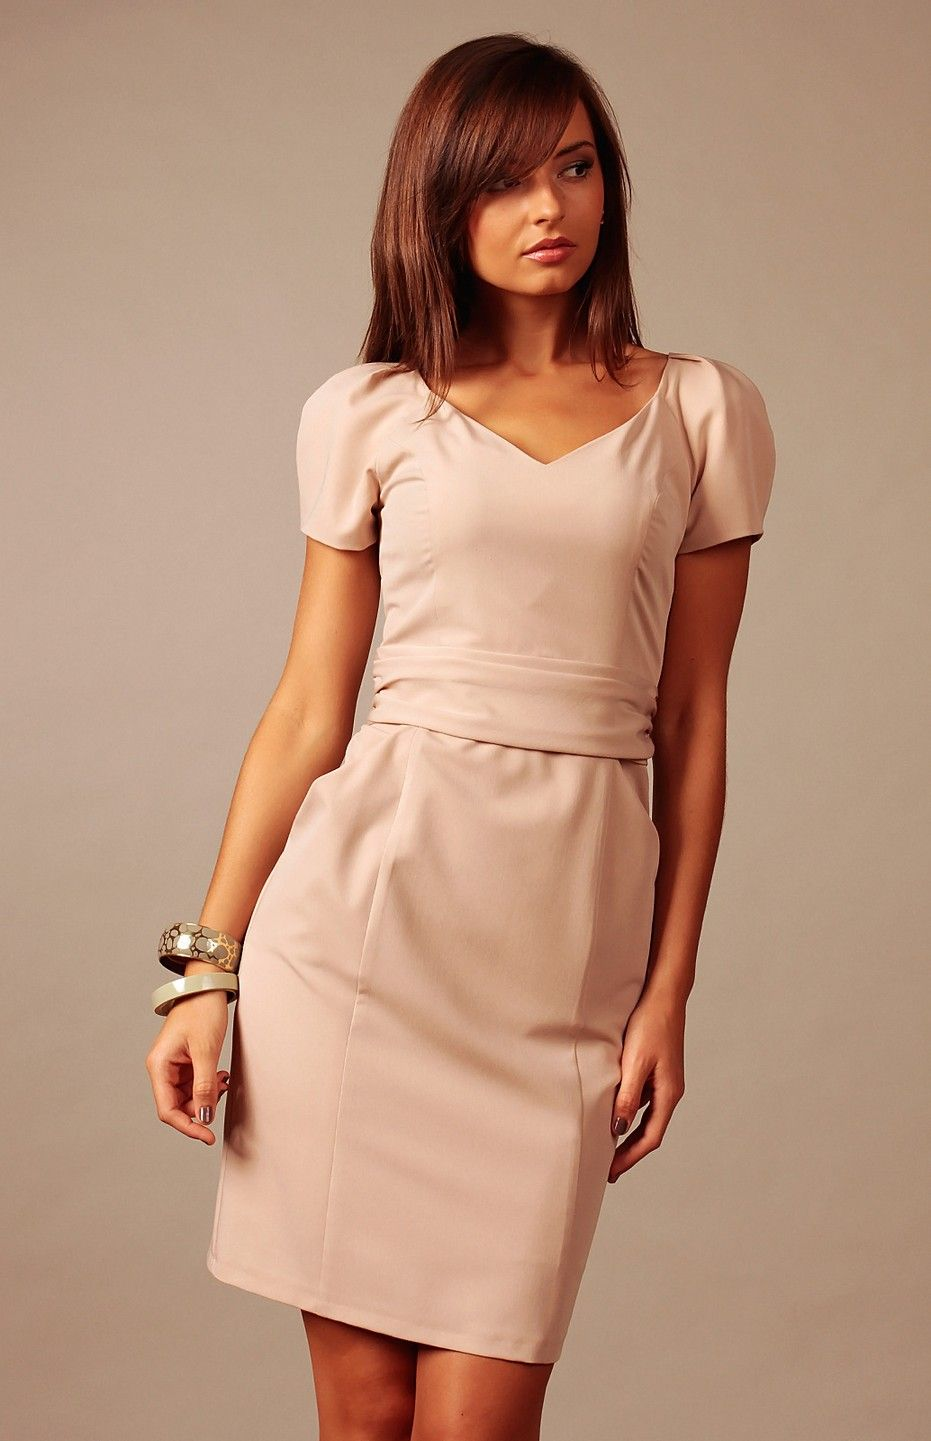 7354a3beab0 Petite robe beige charmante et polyvalente.